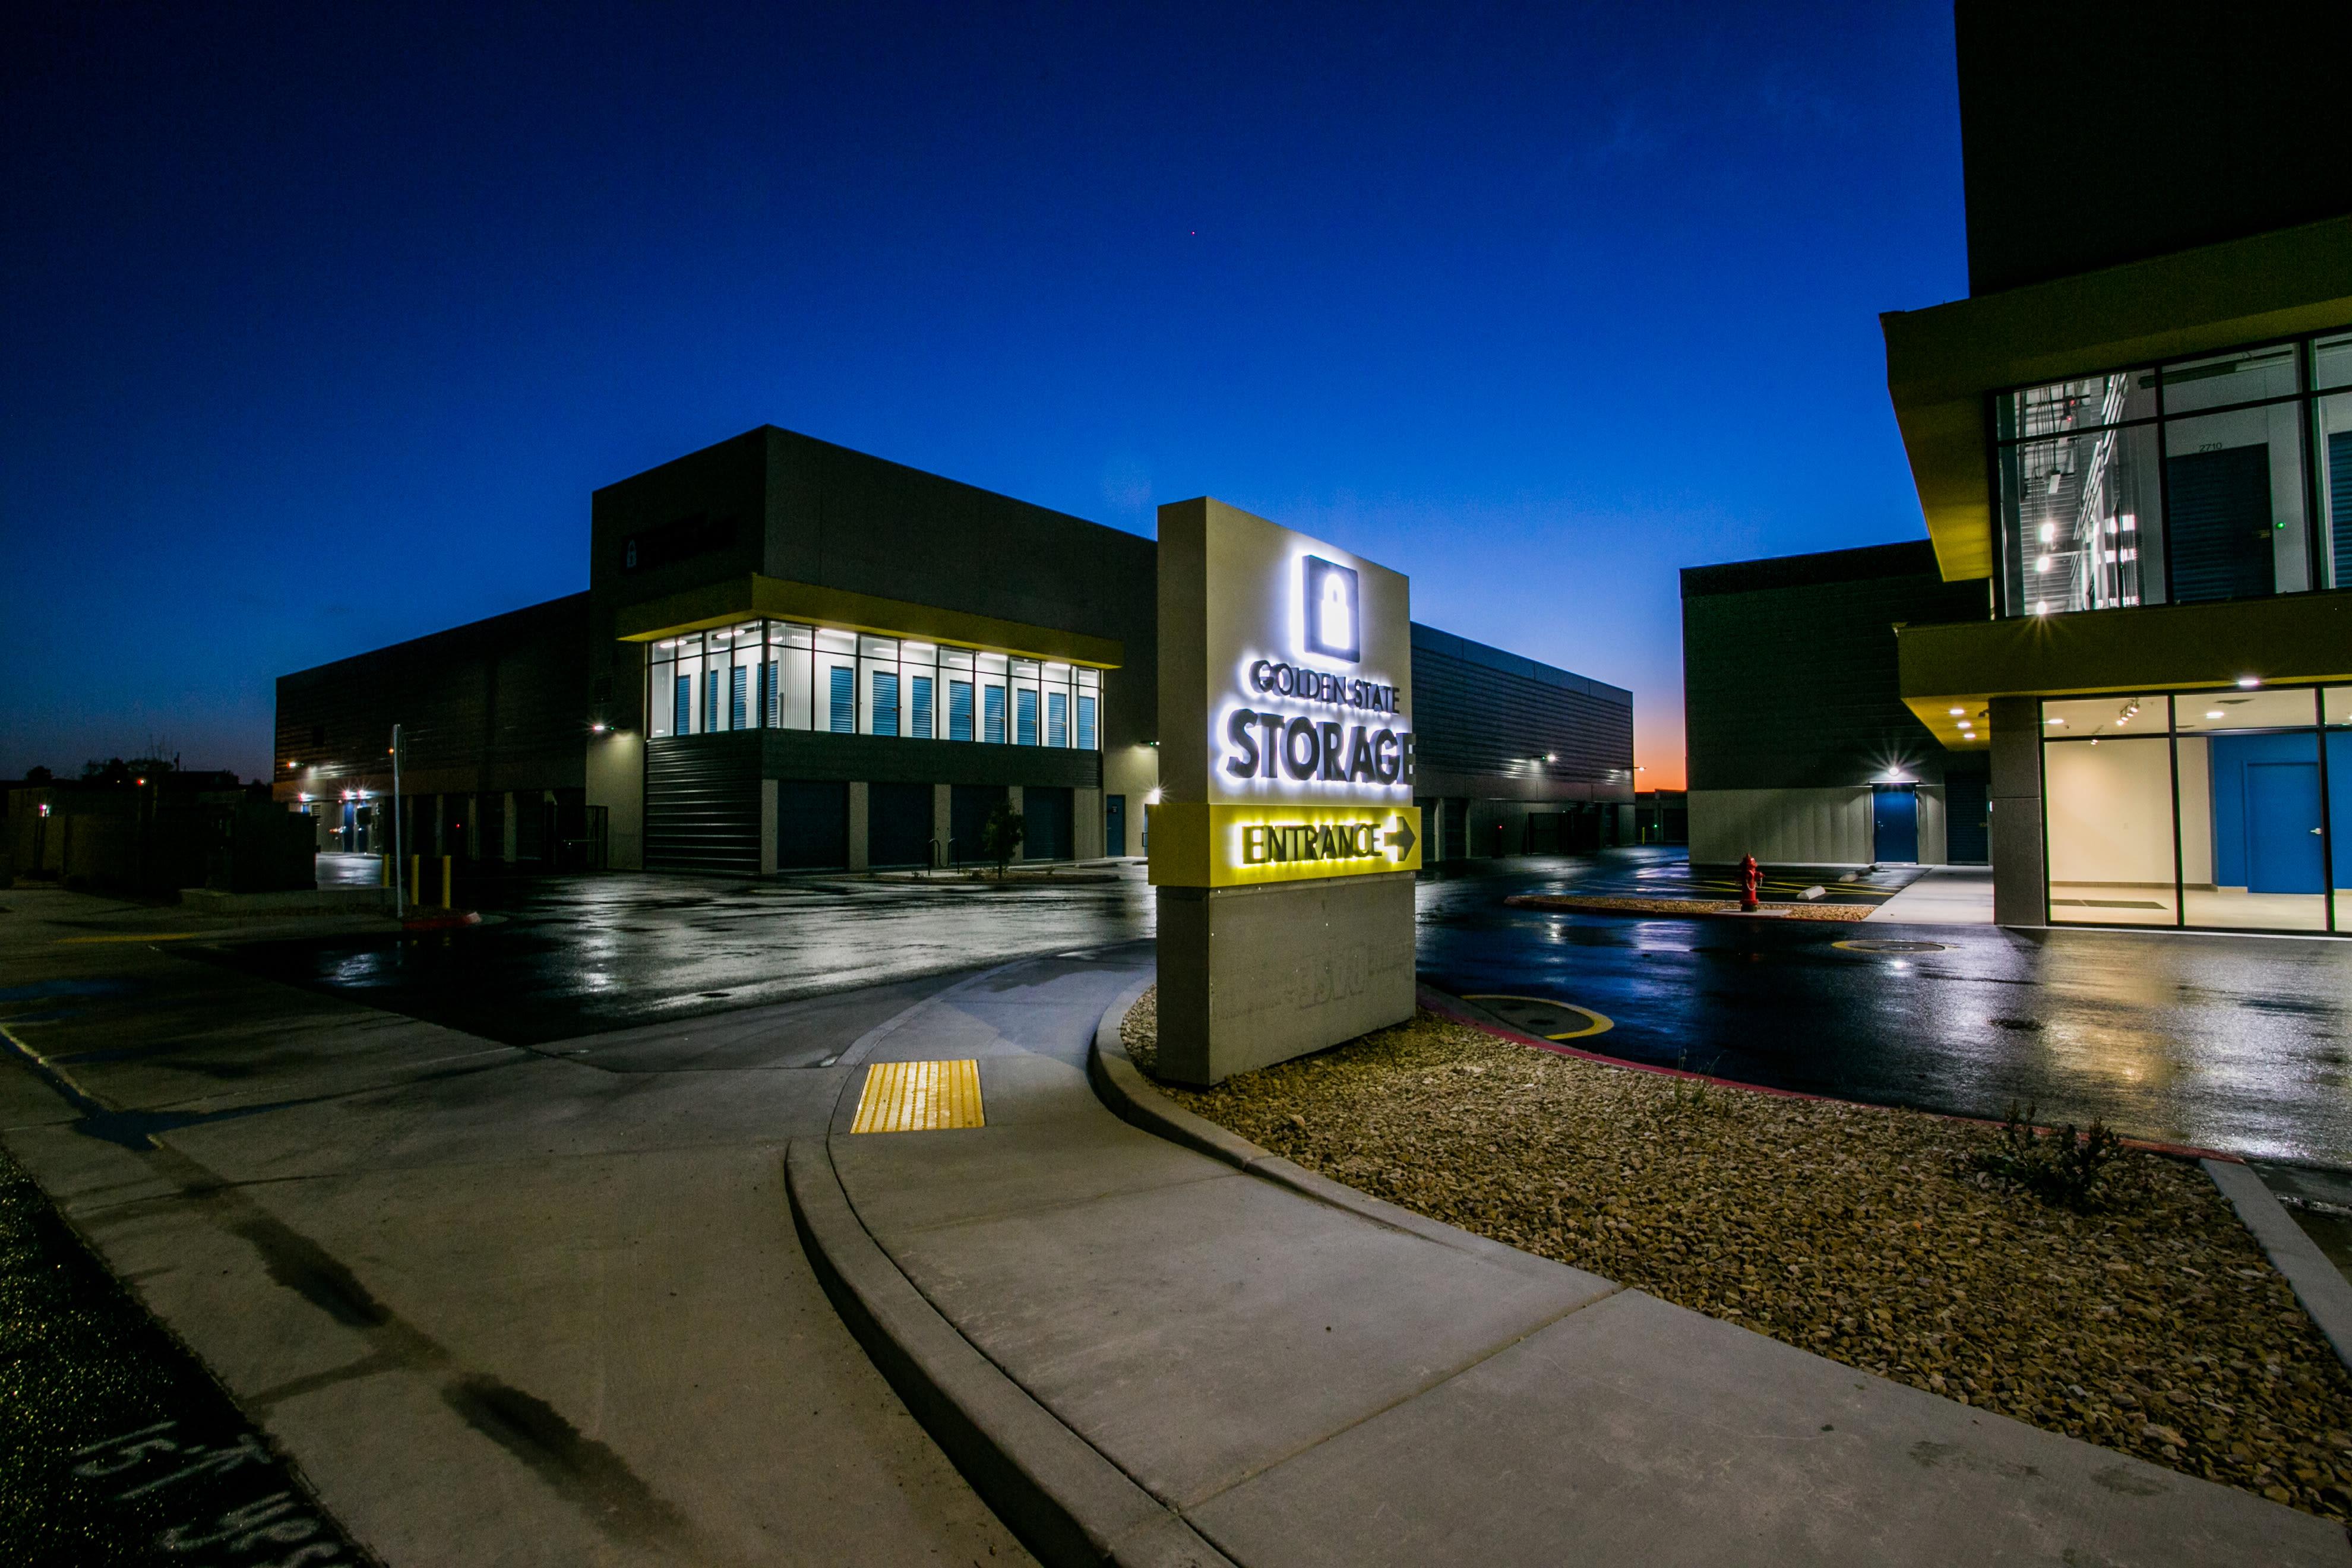 Exterior at night Golden State Storage - Blue Diamond in Las Vegas, Nevada